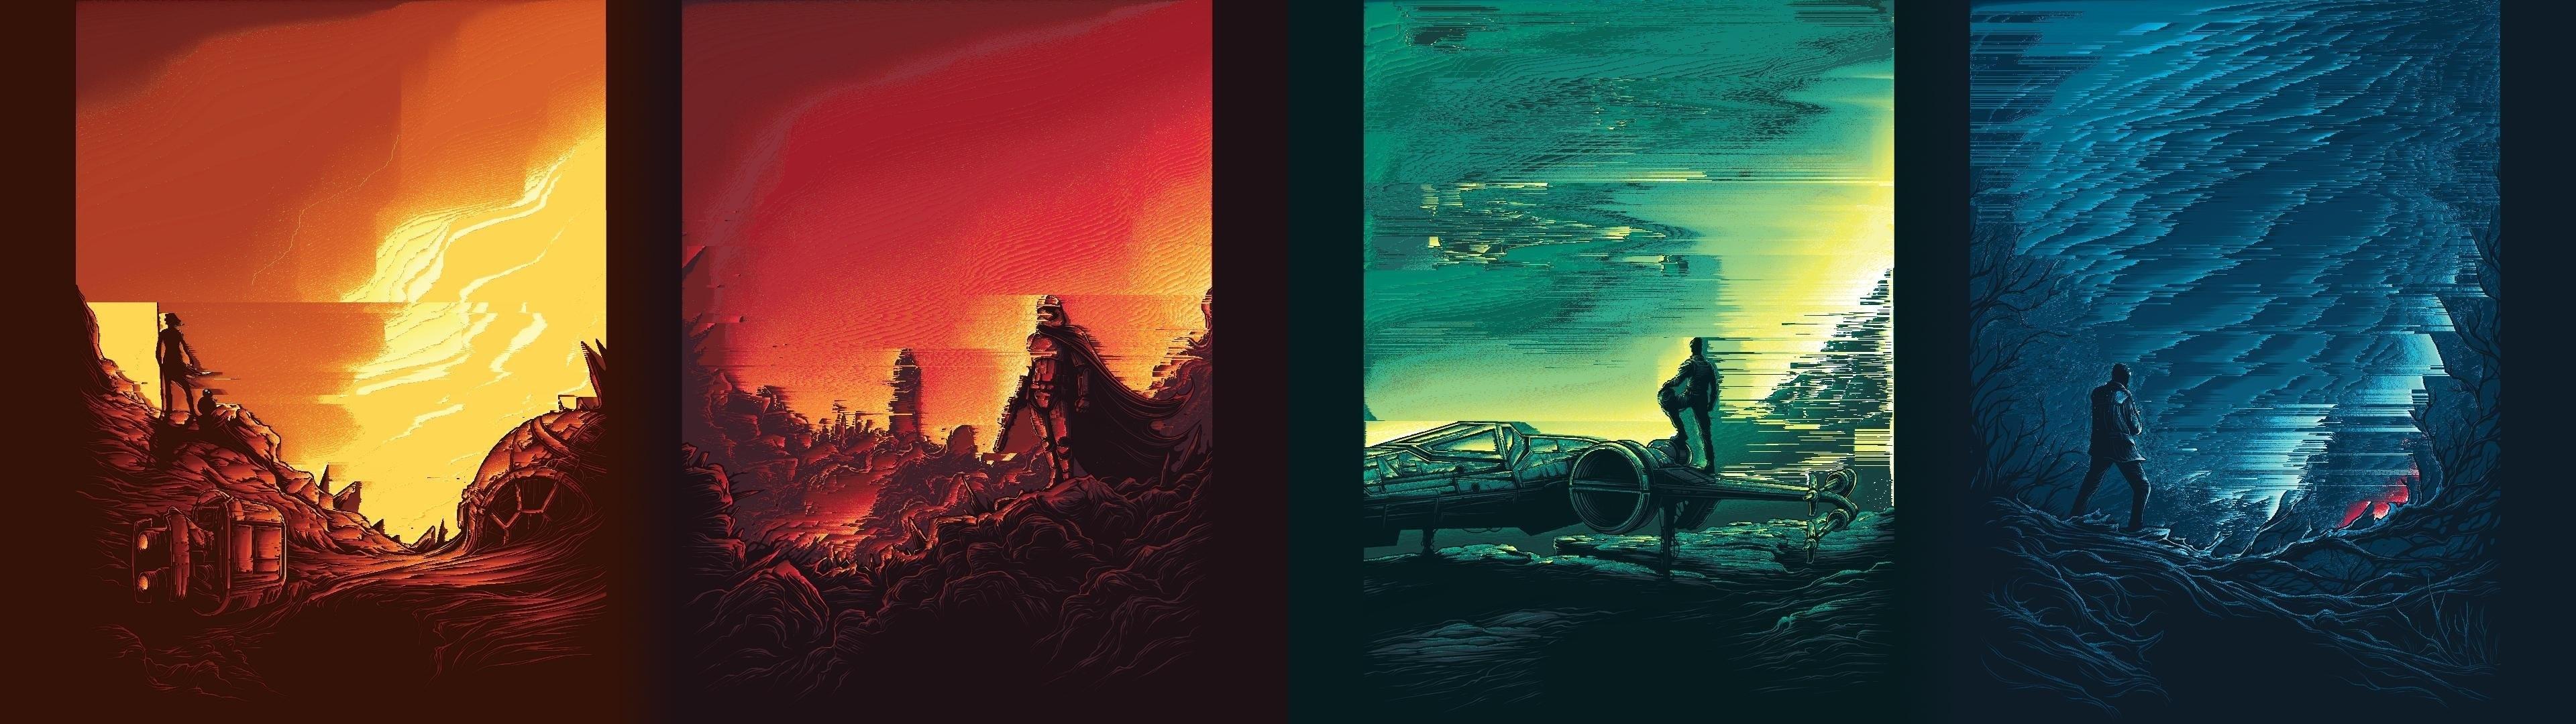 Title : wallpaper : star wars, atmosphere, dual monitors, multiple display. Dimension : 3840 x 1080. File Type : JPG/JPEG